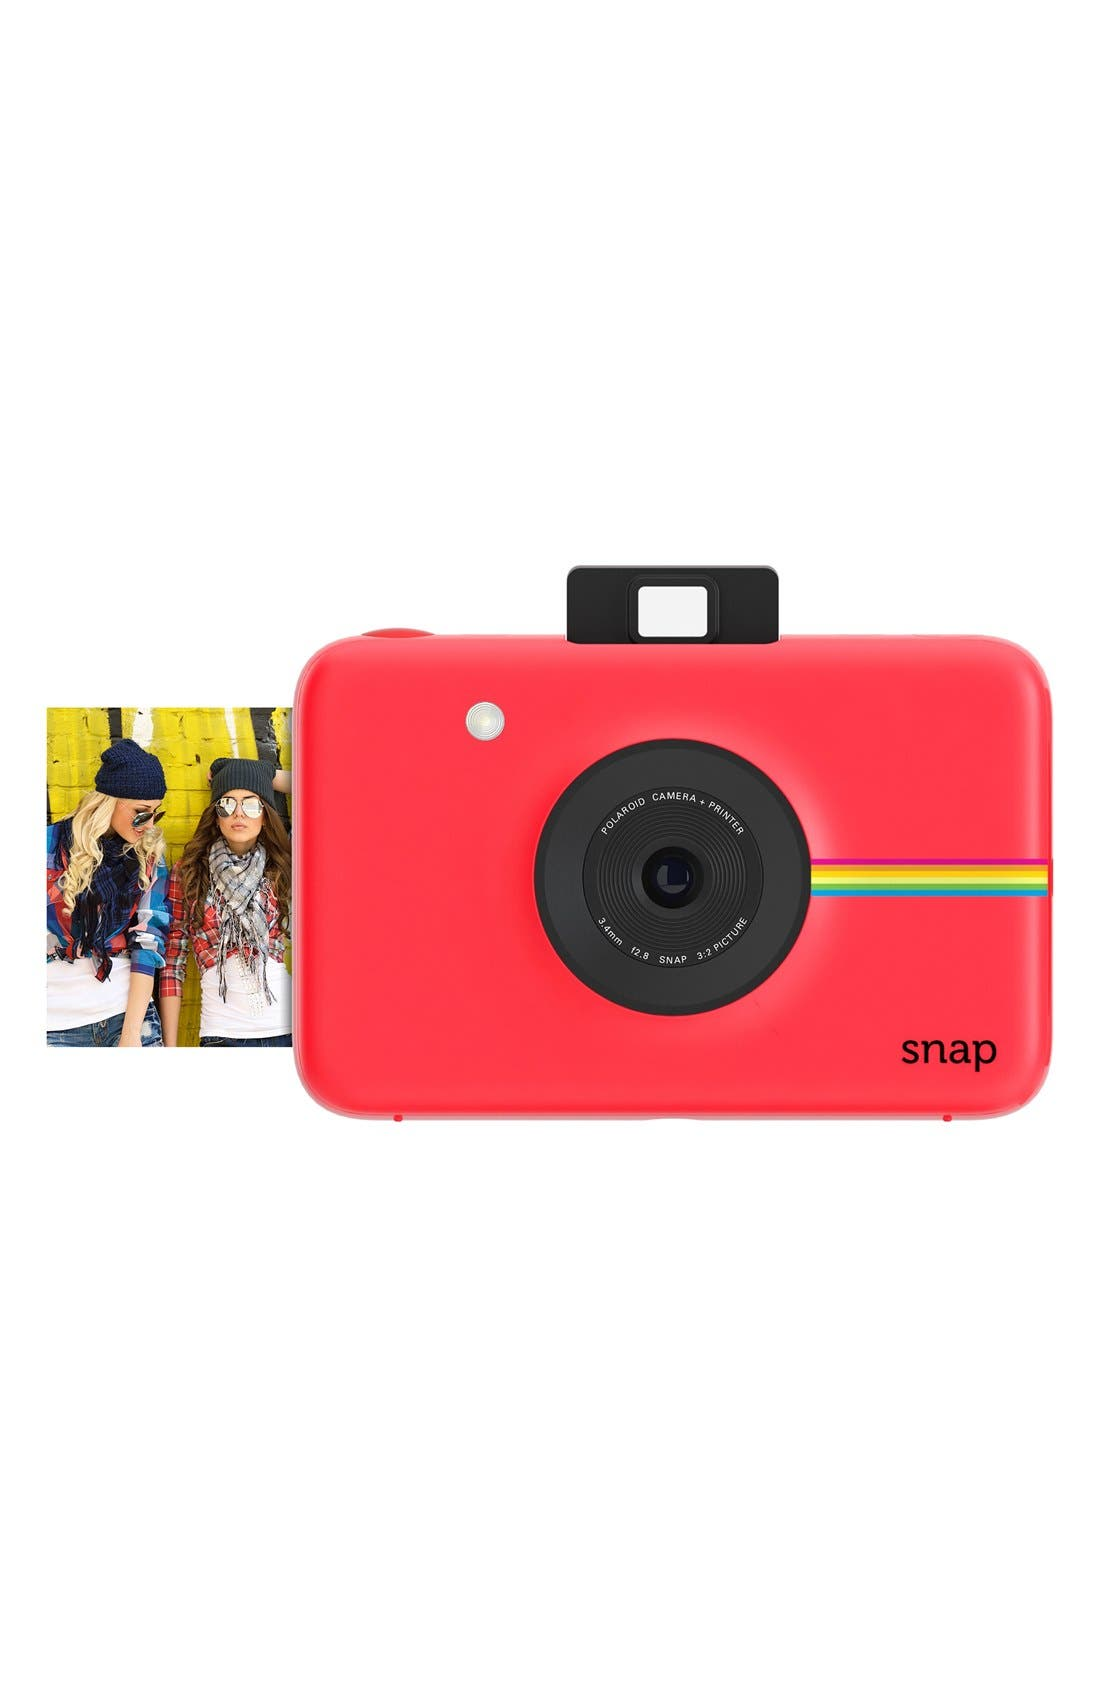 Main Image - Polaroid 'Snap' Instant Digital Camera